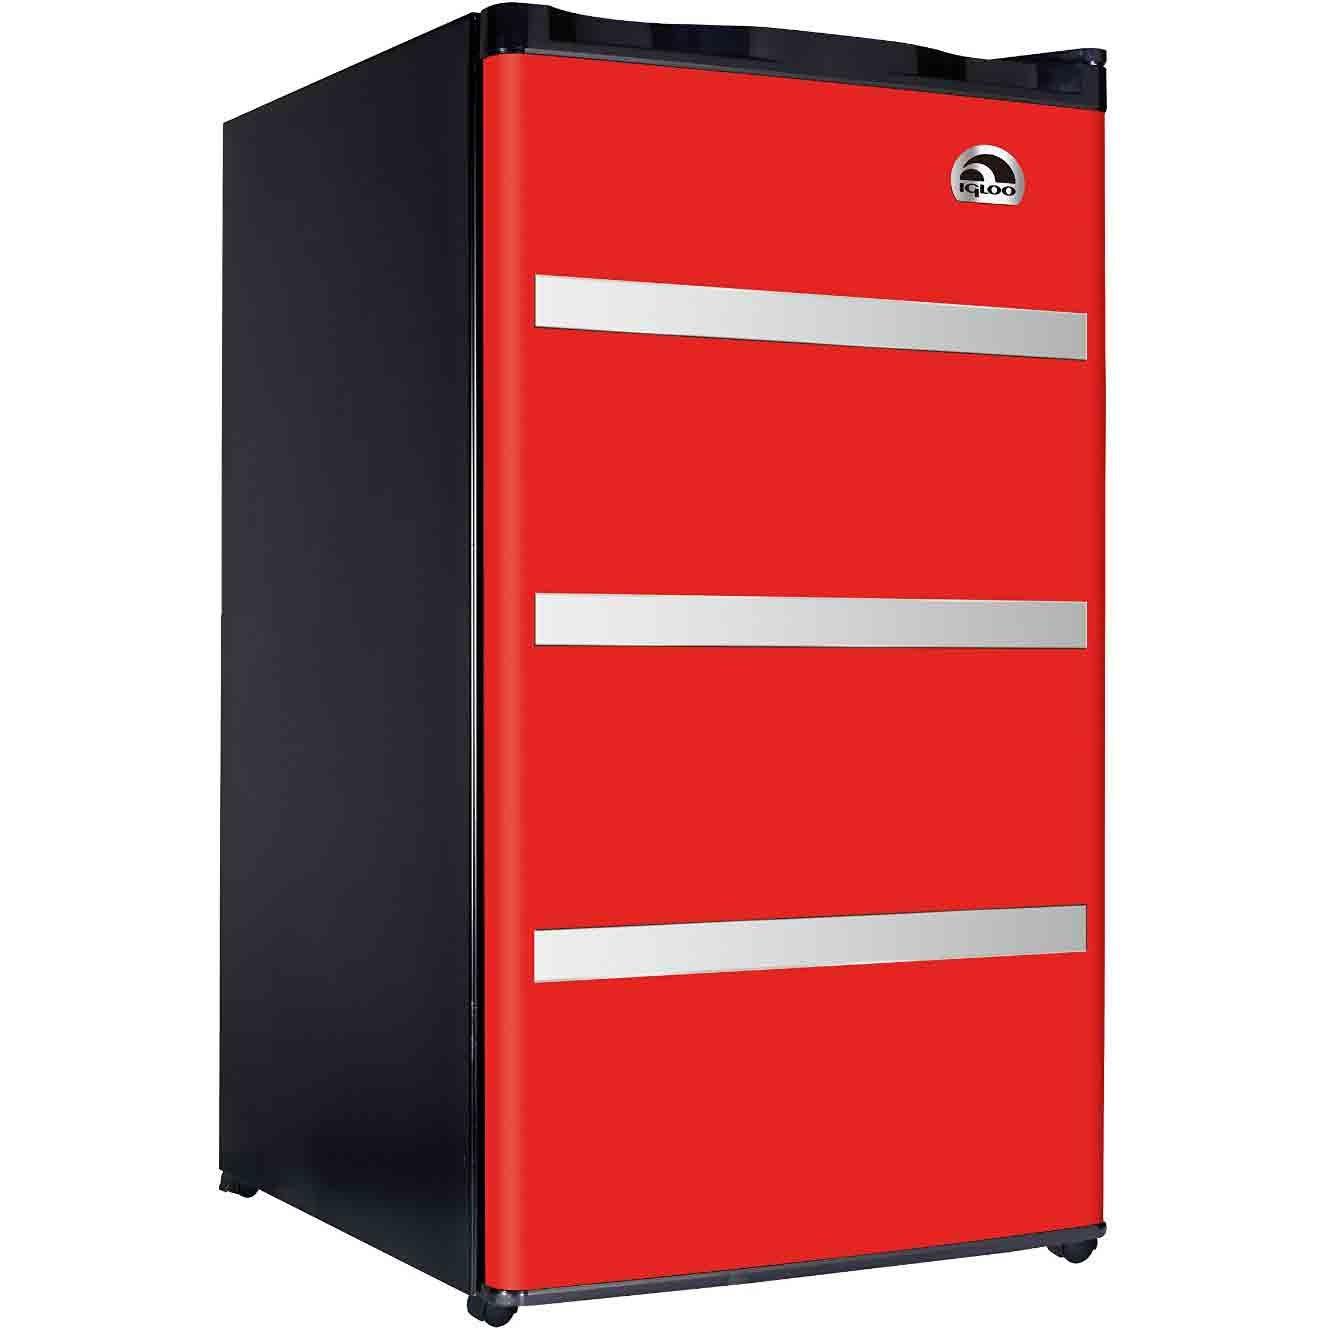 RFR329-Red Garage Fridge Tool Box, 3.2 Cubic Feet, Red by RCA